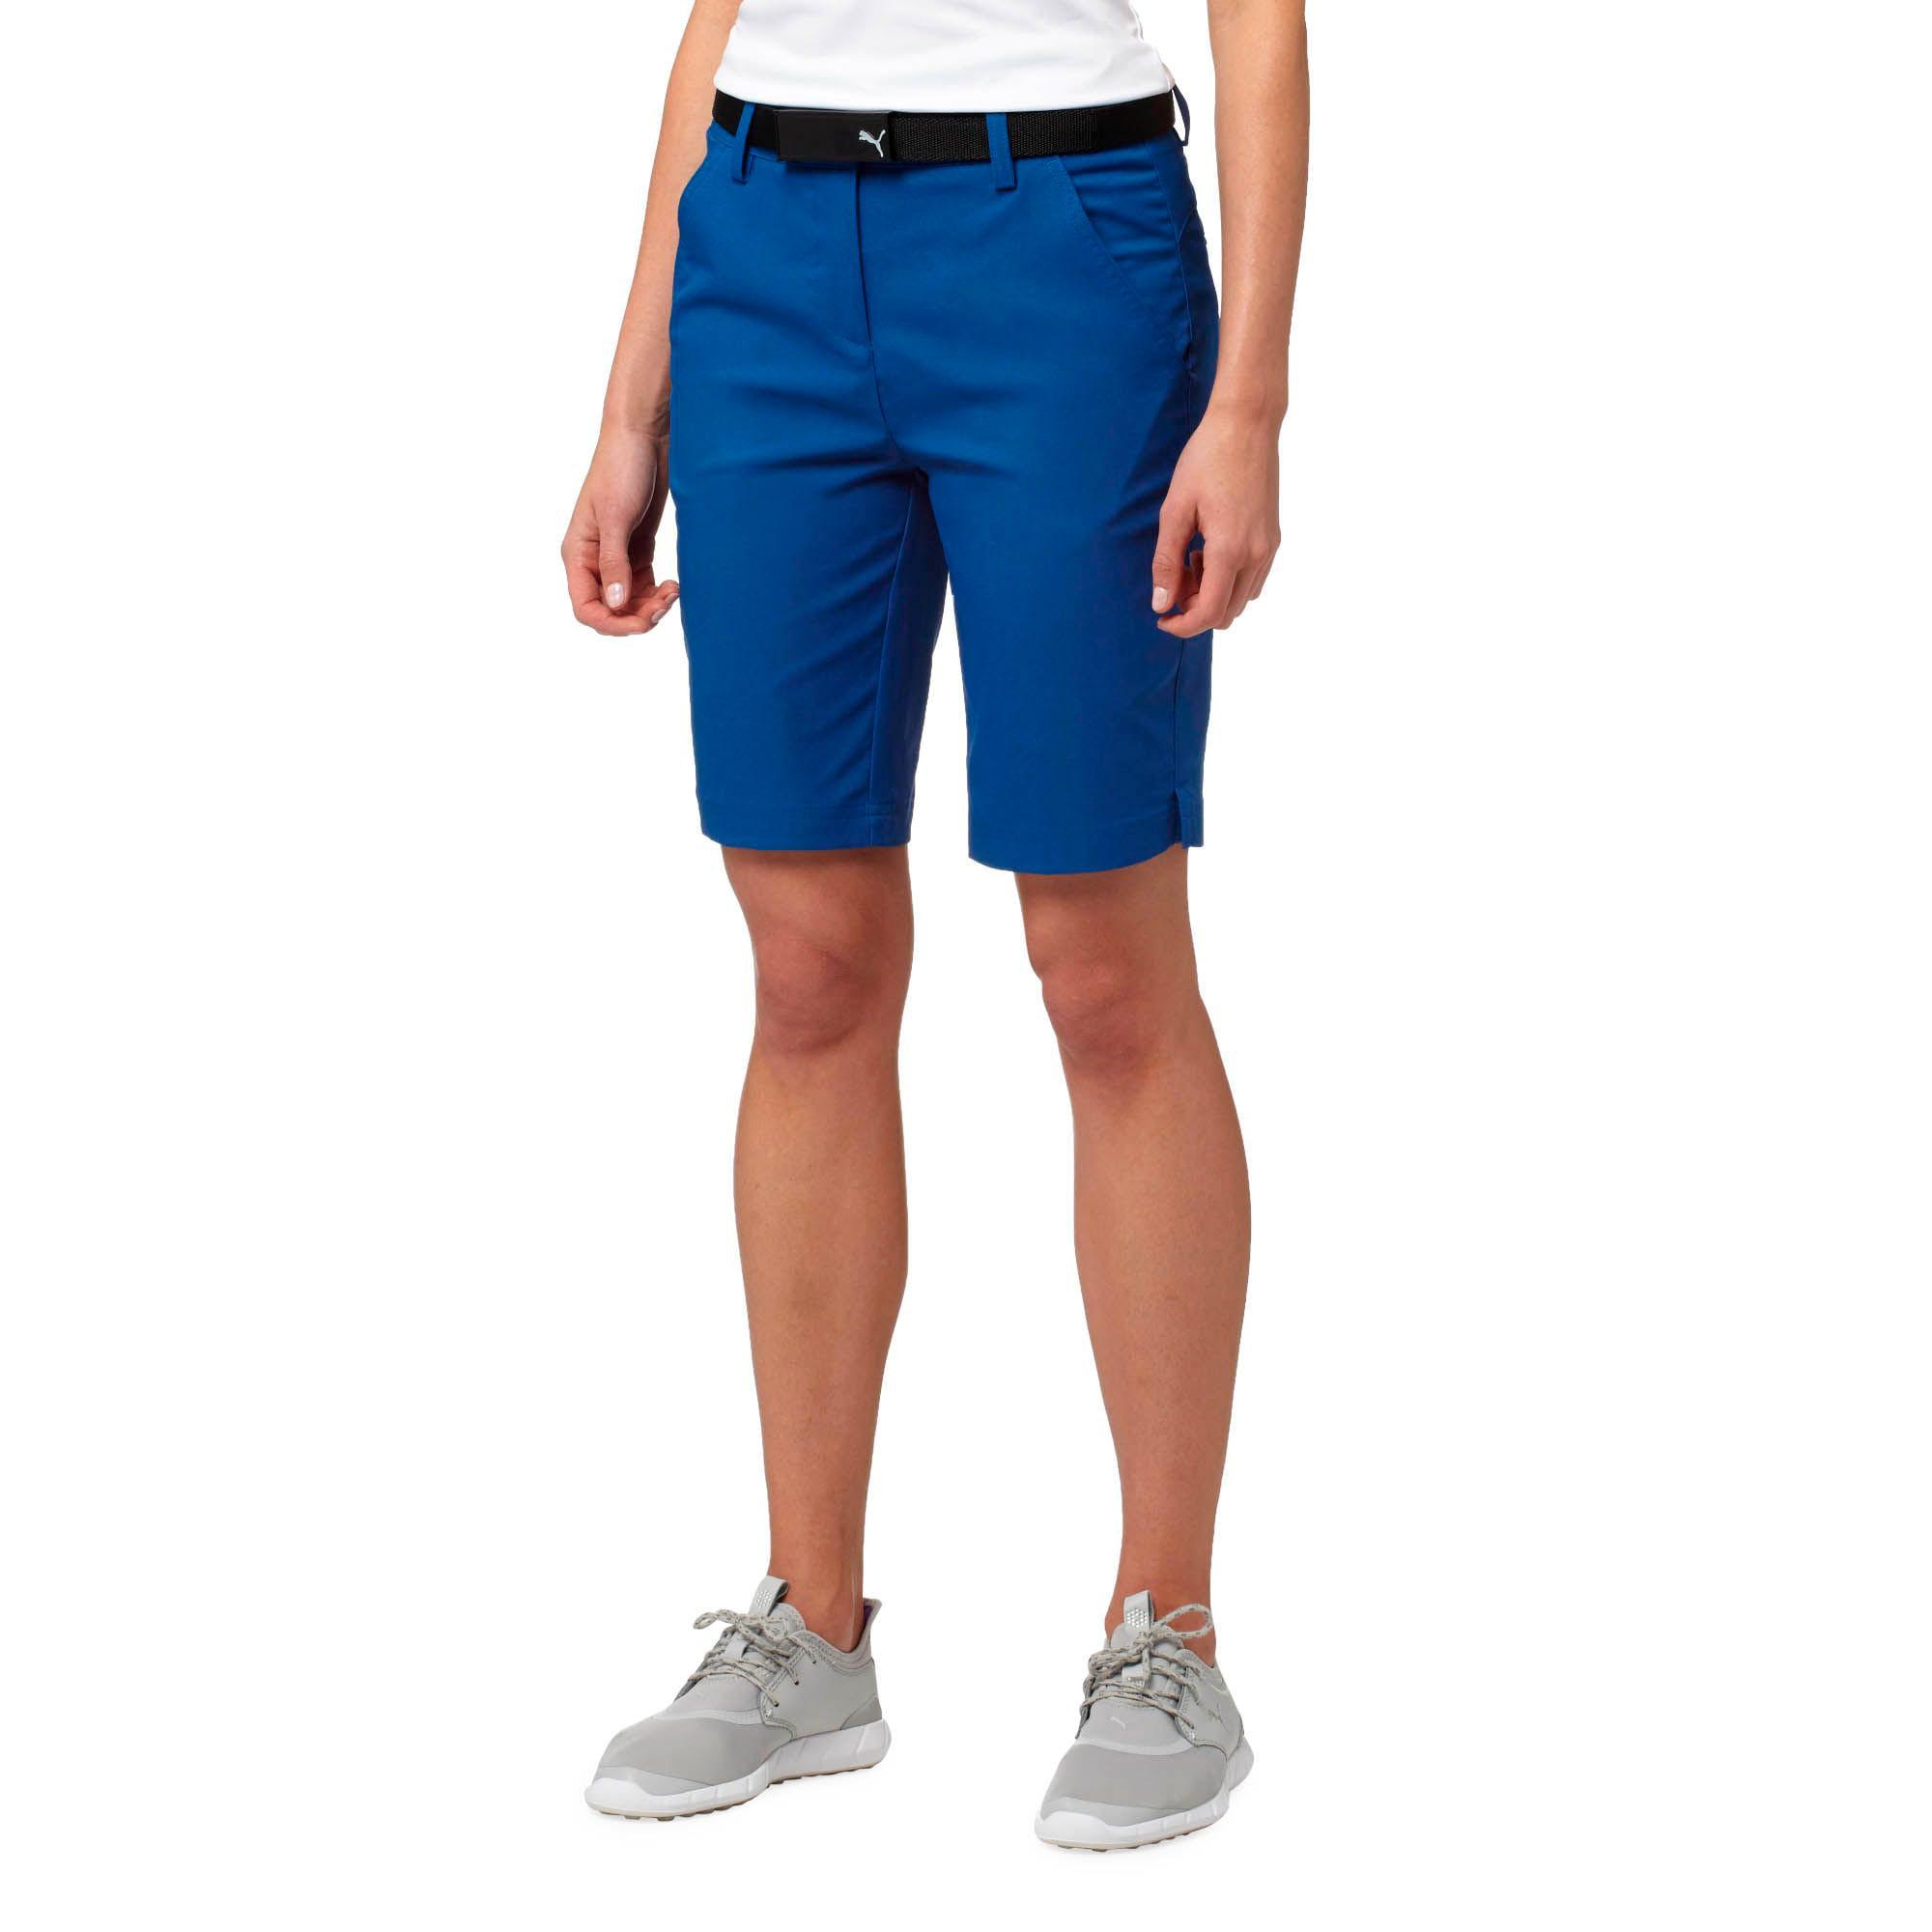 Thumbnail 2 of Pounce Bermuda Shorts, TRUE BLUE, medium